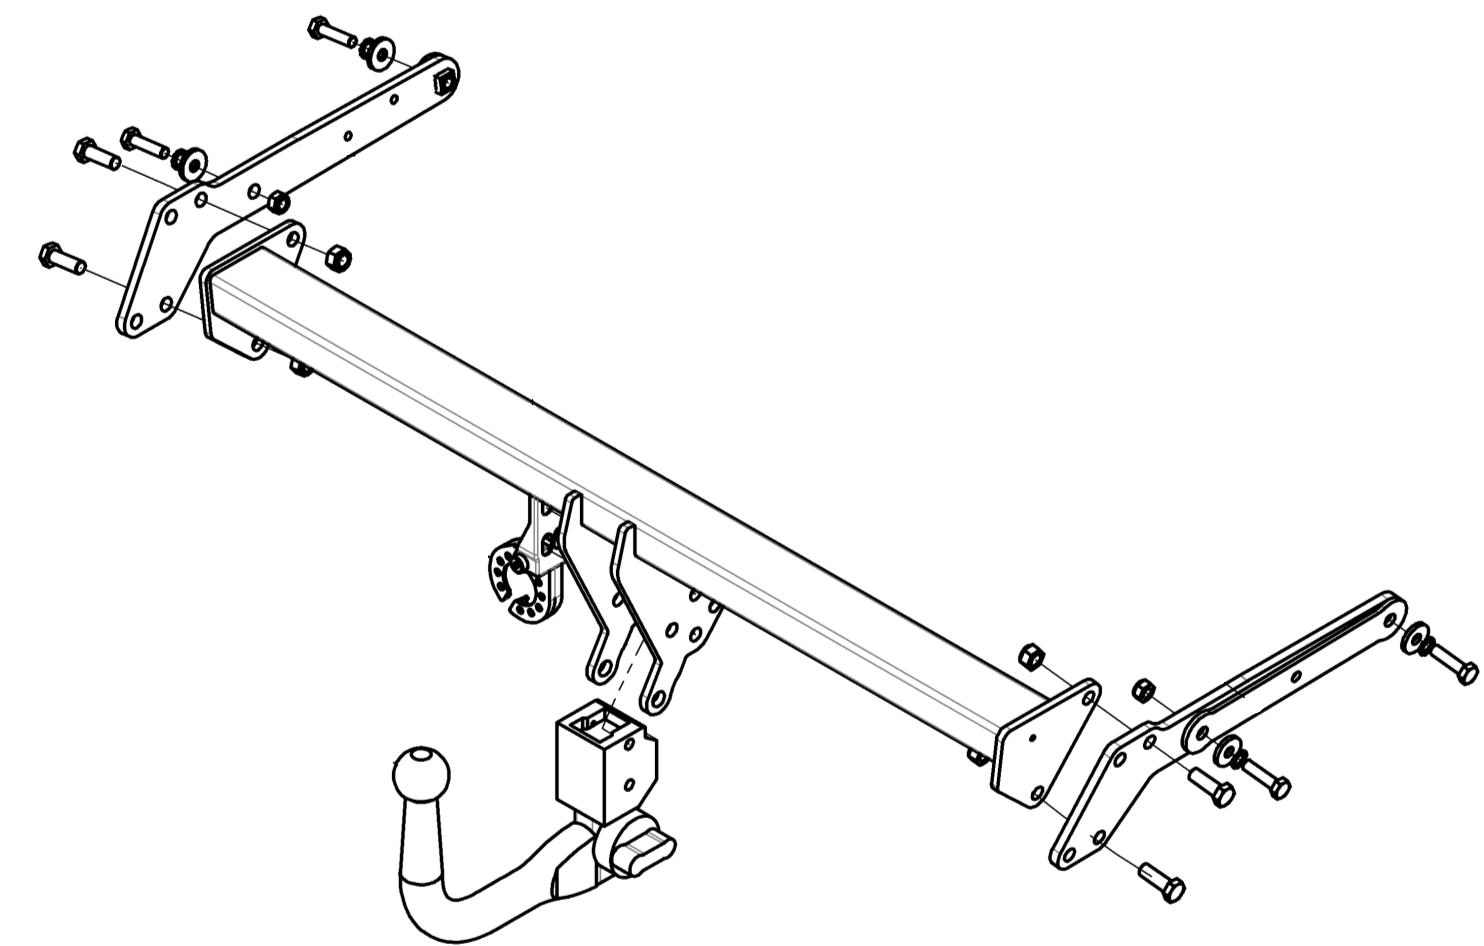 Detachable Swan Neck Towbar for Ford Focus IV Hatchback 09